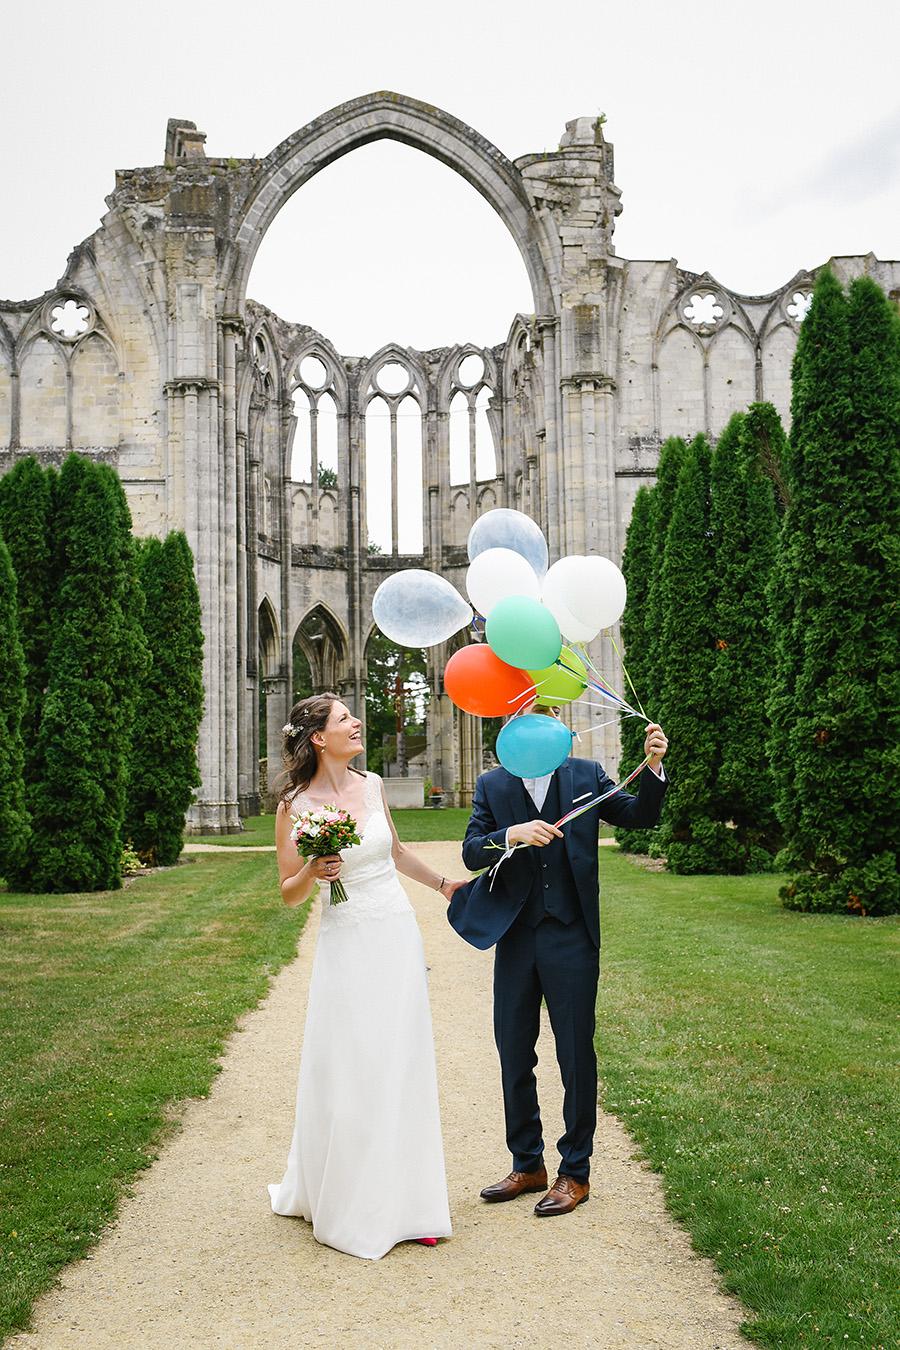 mariage_VT_Chauny_aisne_02_photographie_clemence_dubois 118